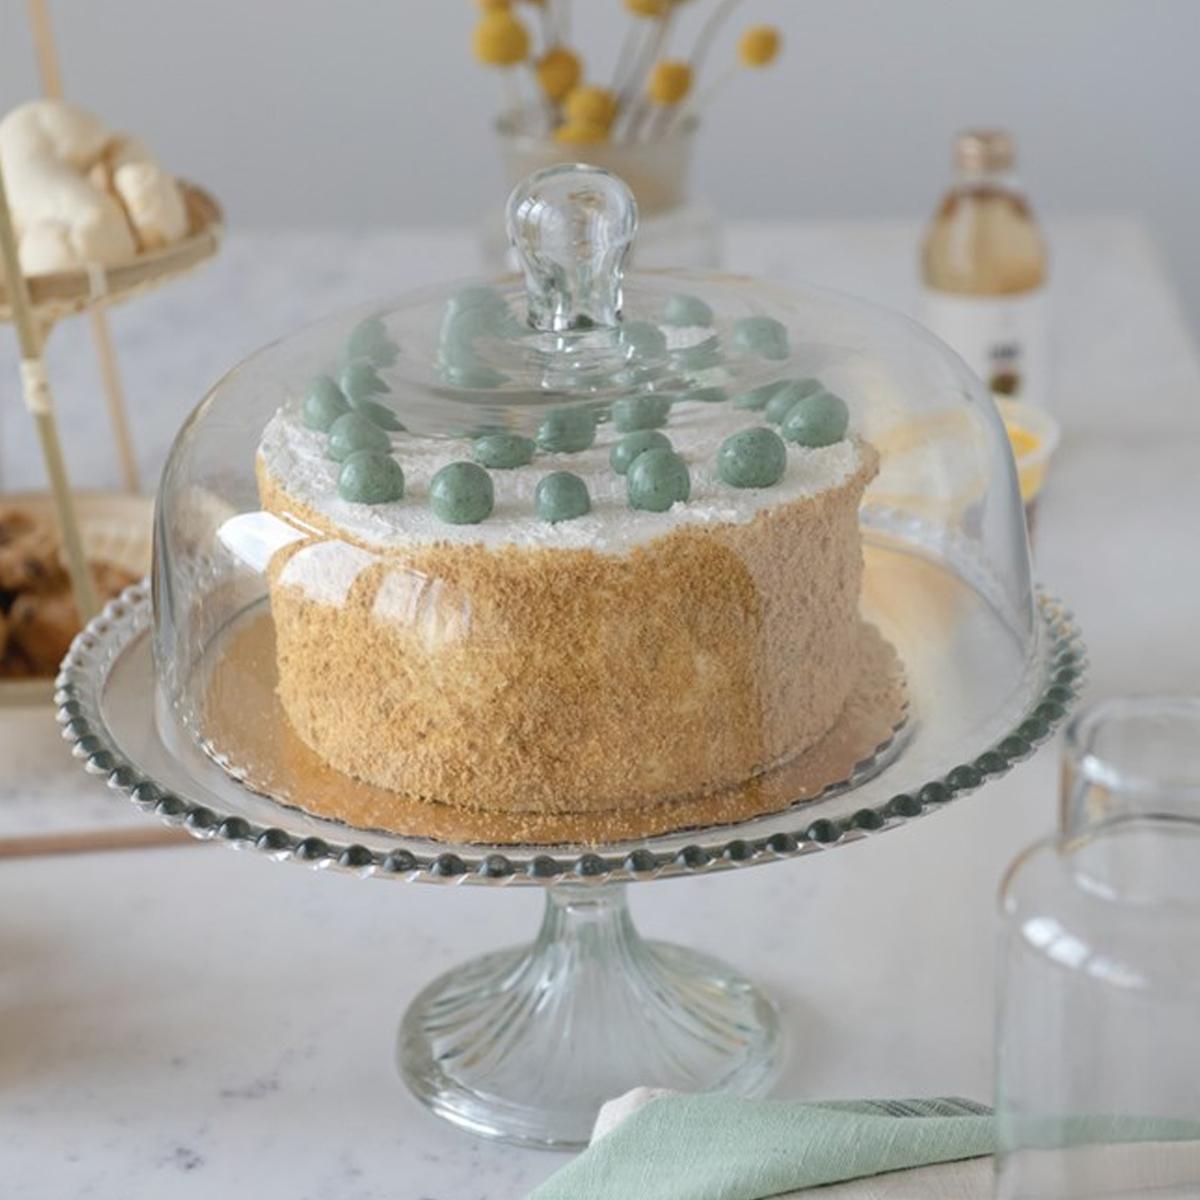 Picture of GLASS CAKE STAND & CLOCHE